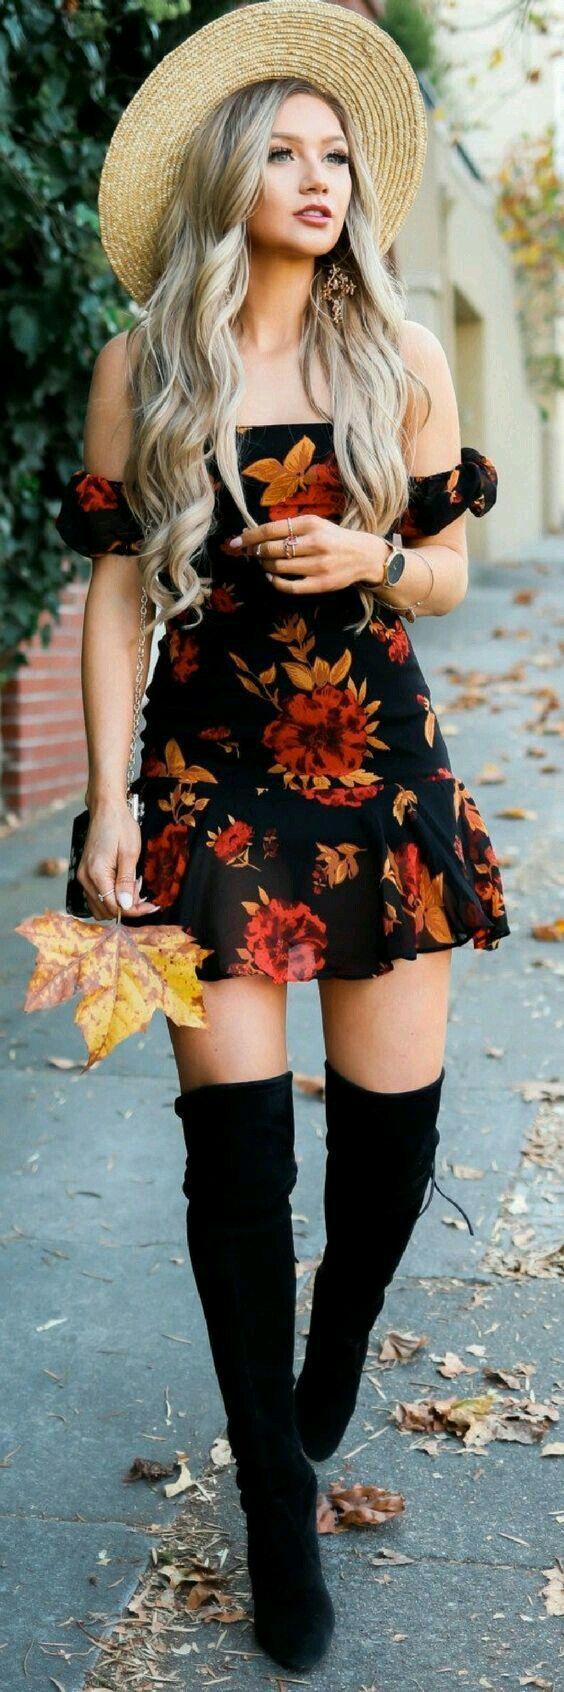 Elegant women fashion outfit idea featuring a street style fashion